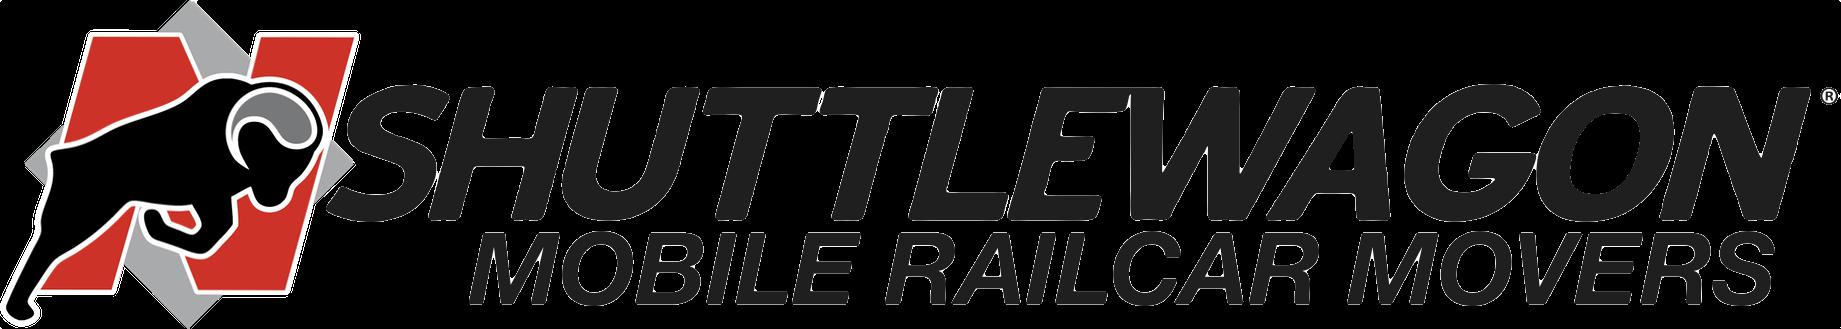 Shuttlewagon-logo-400-c